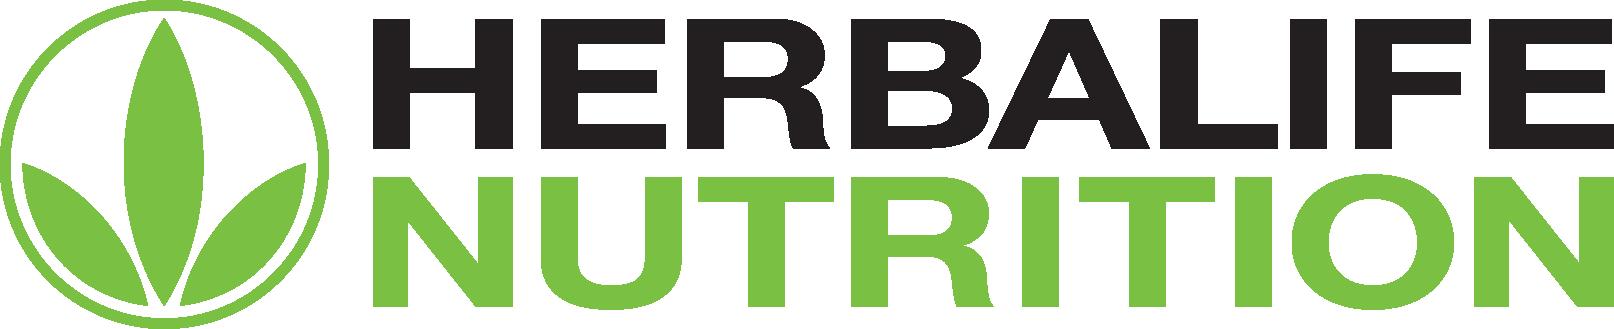 herbalife-nutrition-logo Vector EPS Free Download, Logo ... - Herbalife Graphics